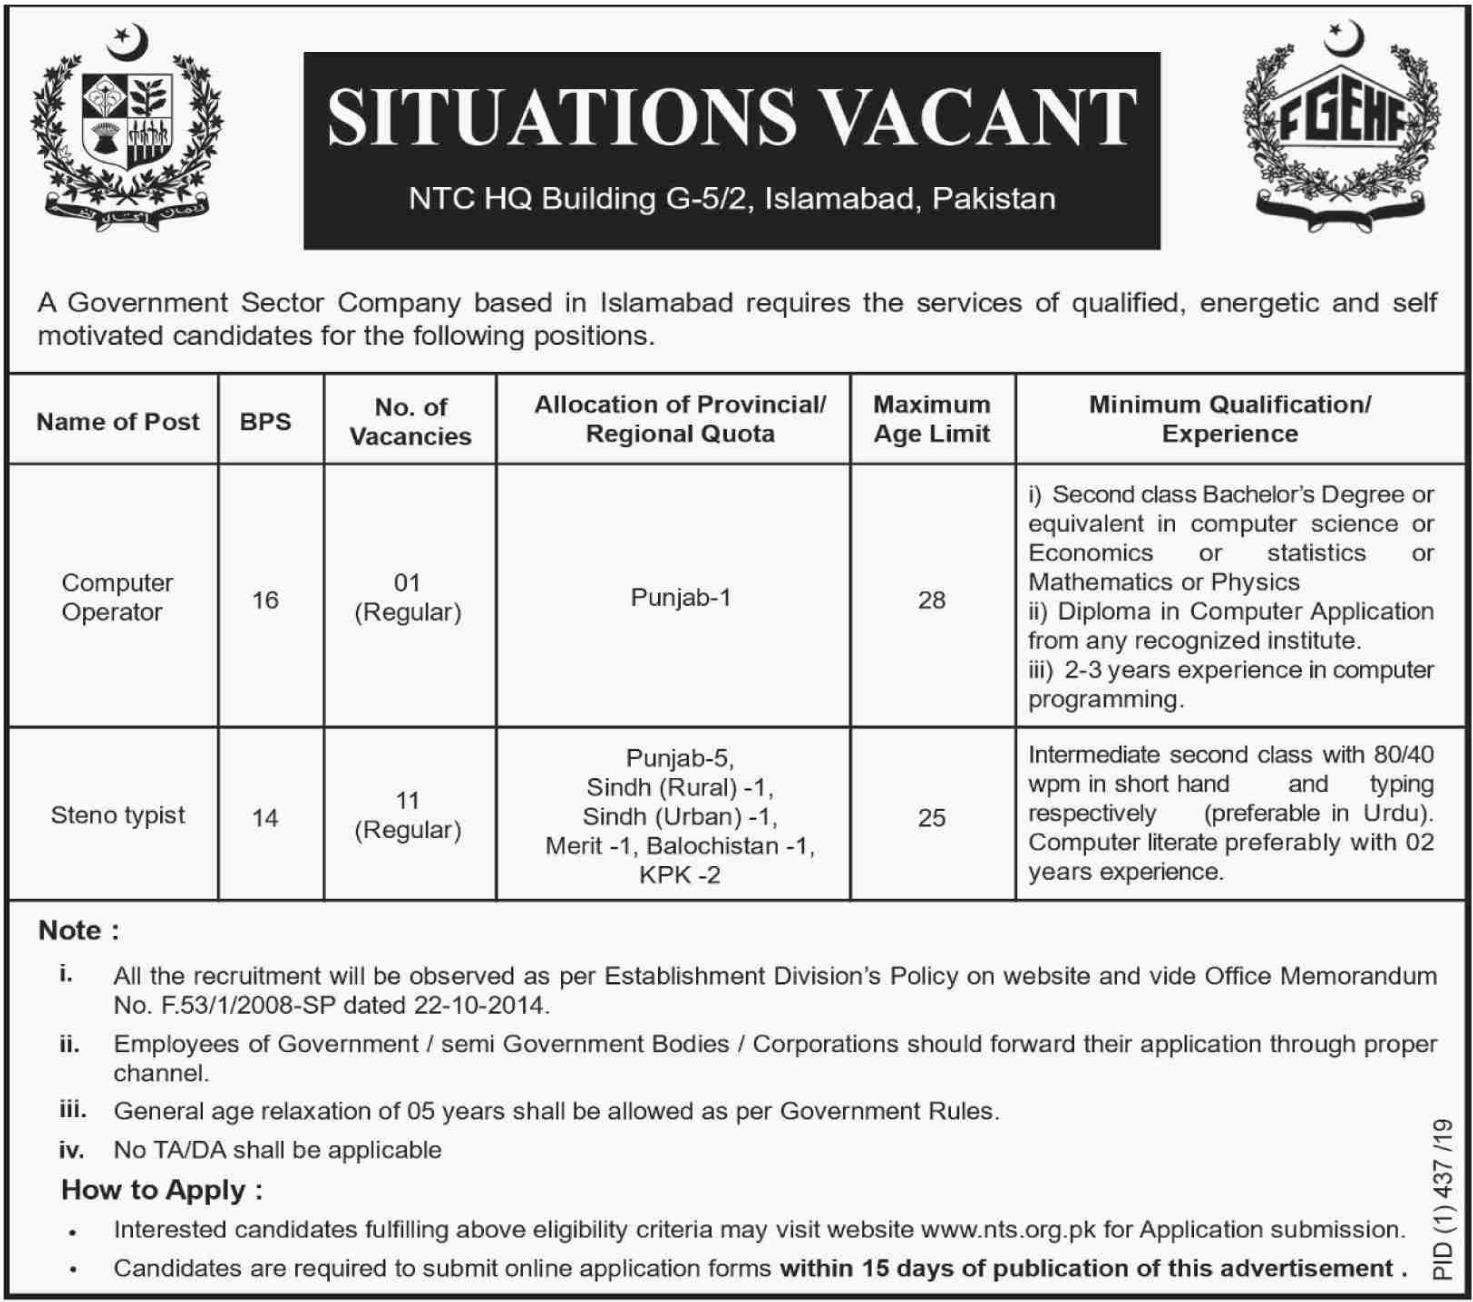 Public Sector Organization Jobs 2019 Application form Eligibility Criteria